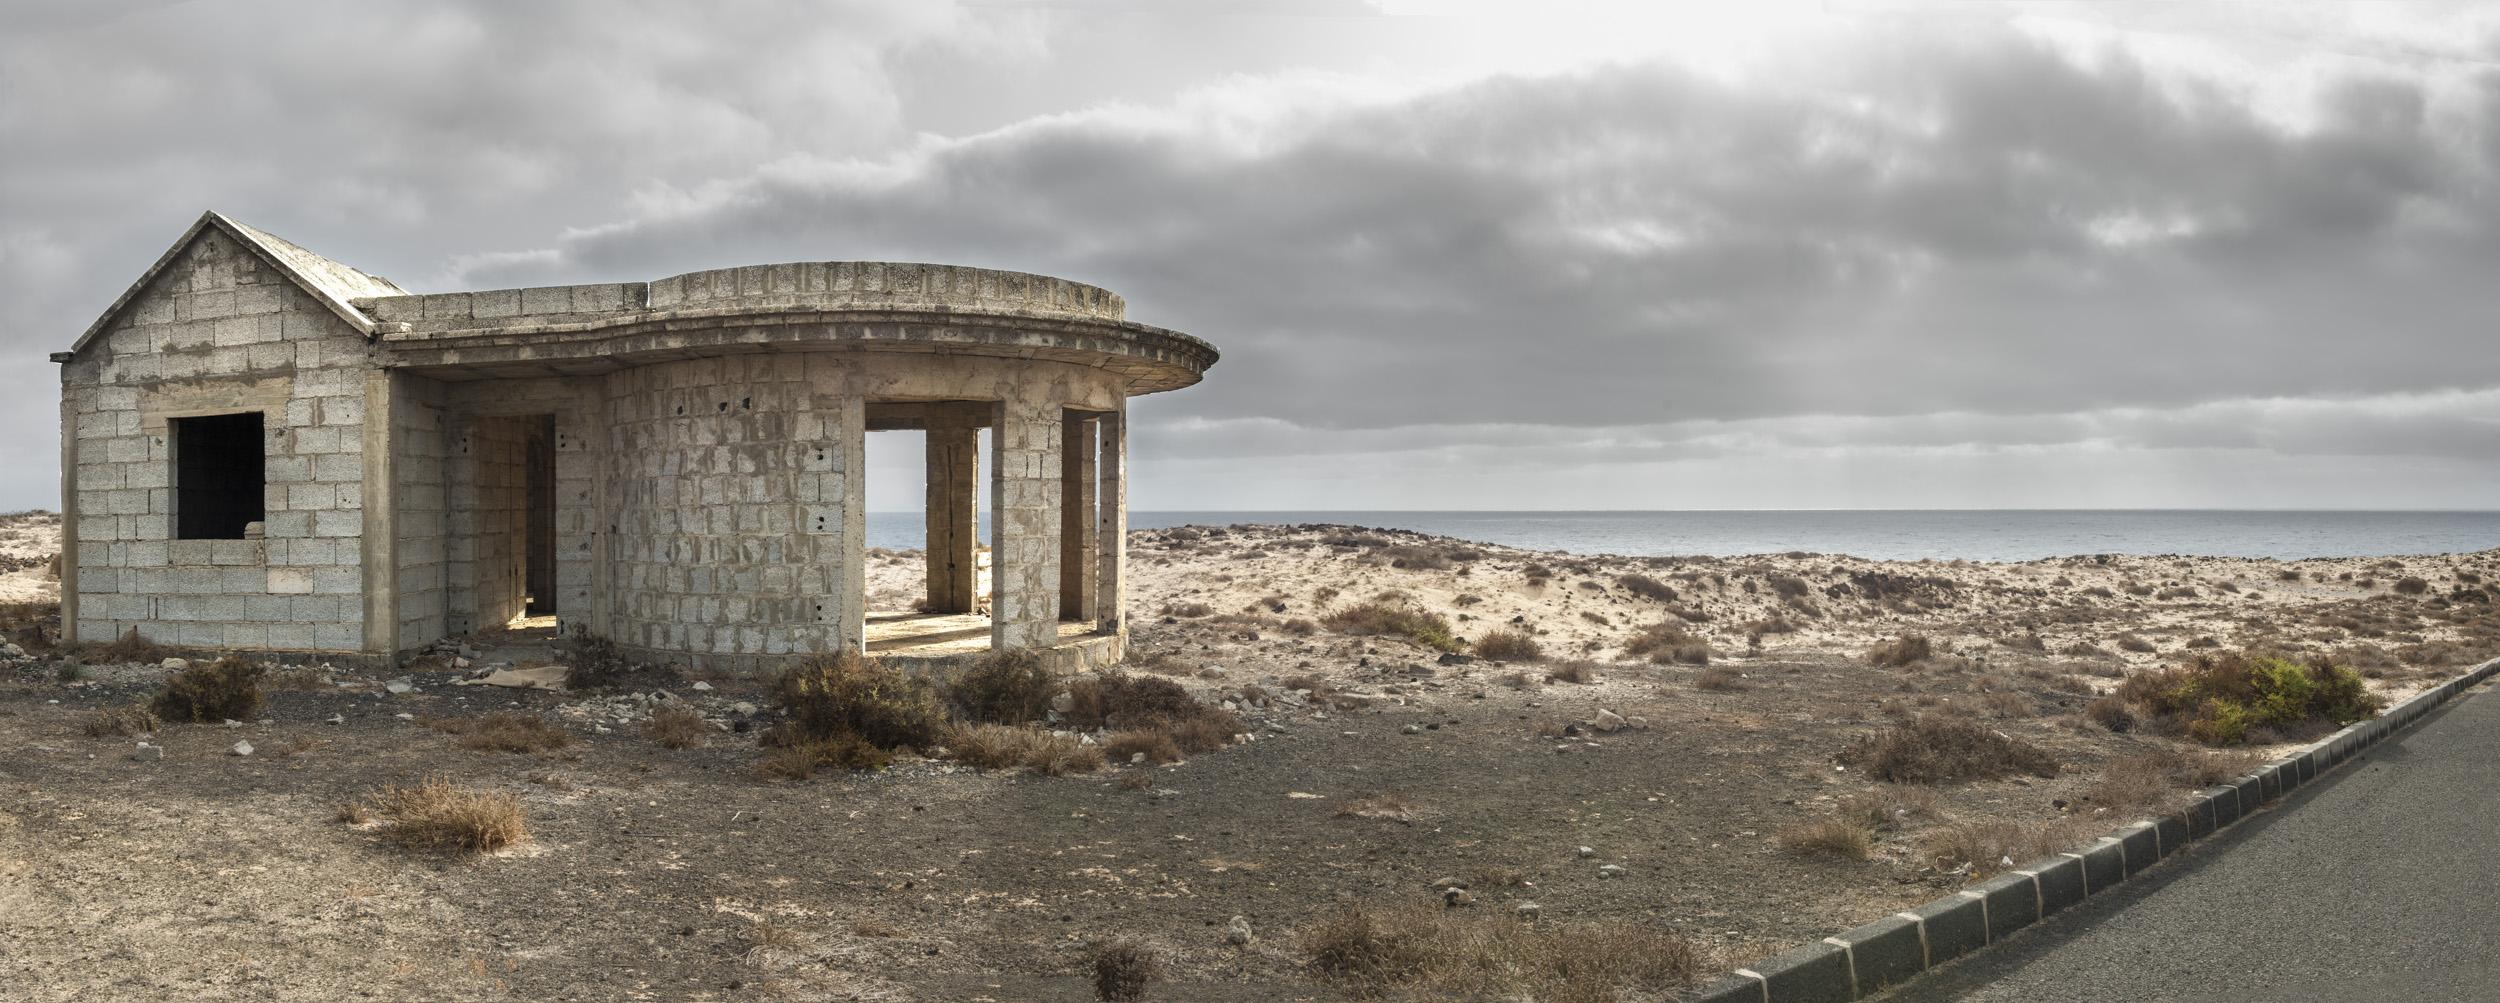 promised paradise - THE ISLAND OF THE HORIZON - cesar azcarate, fotografia